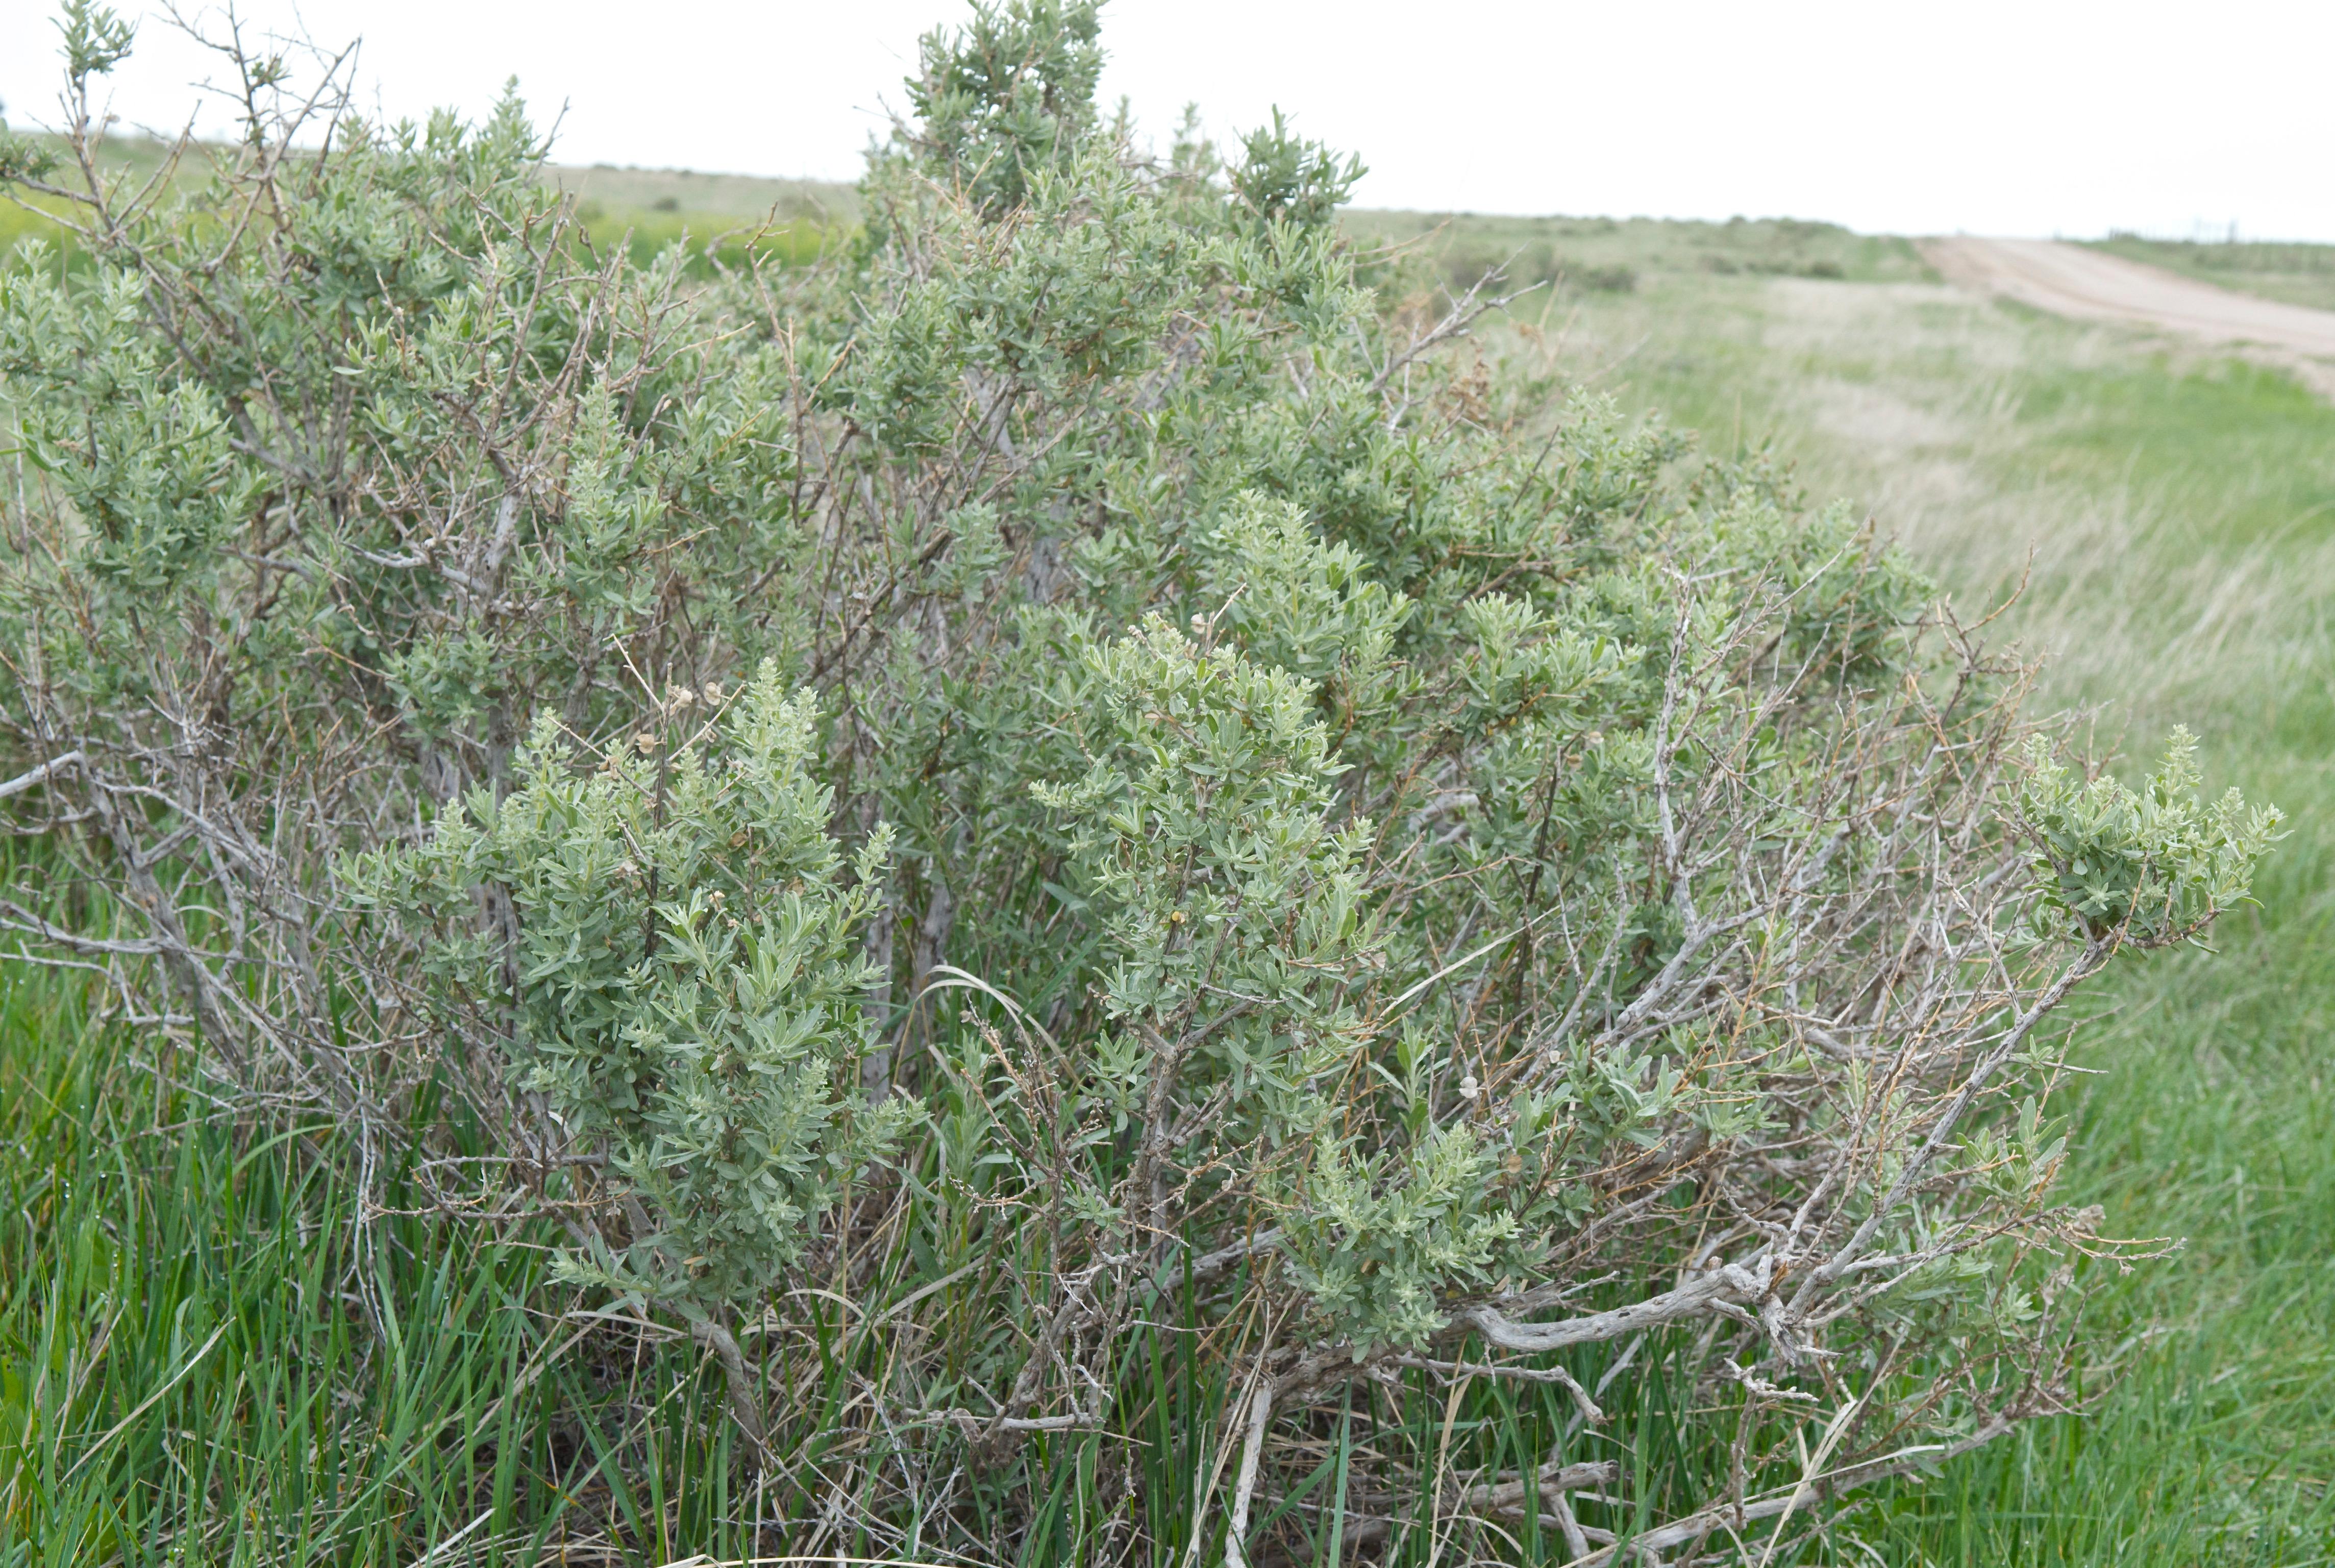 Four-Winged Saltbush (Atriplex canescens)